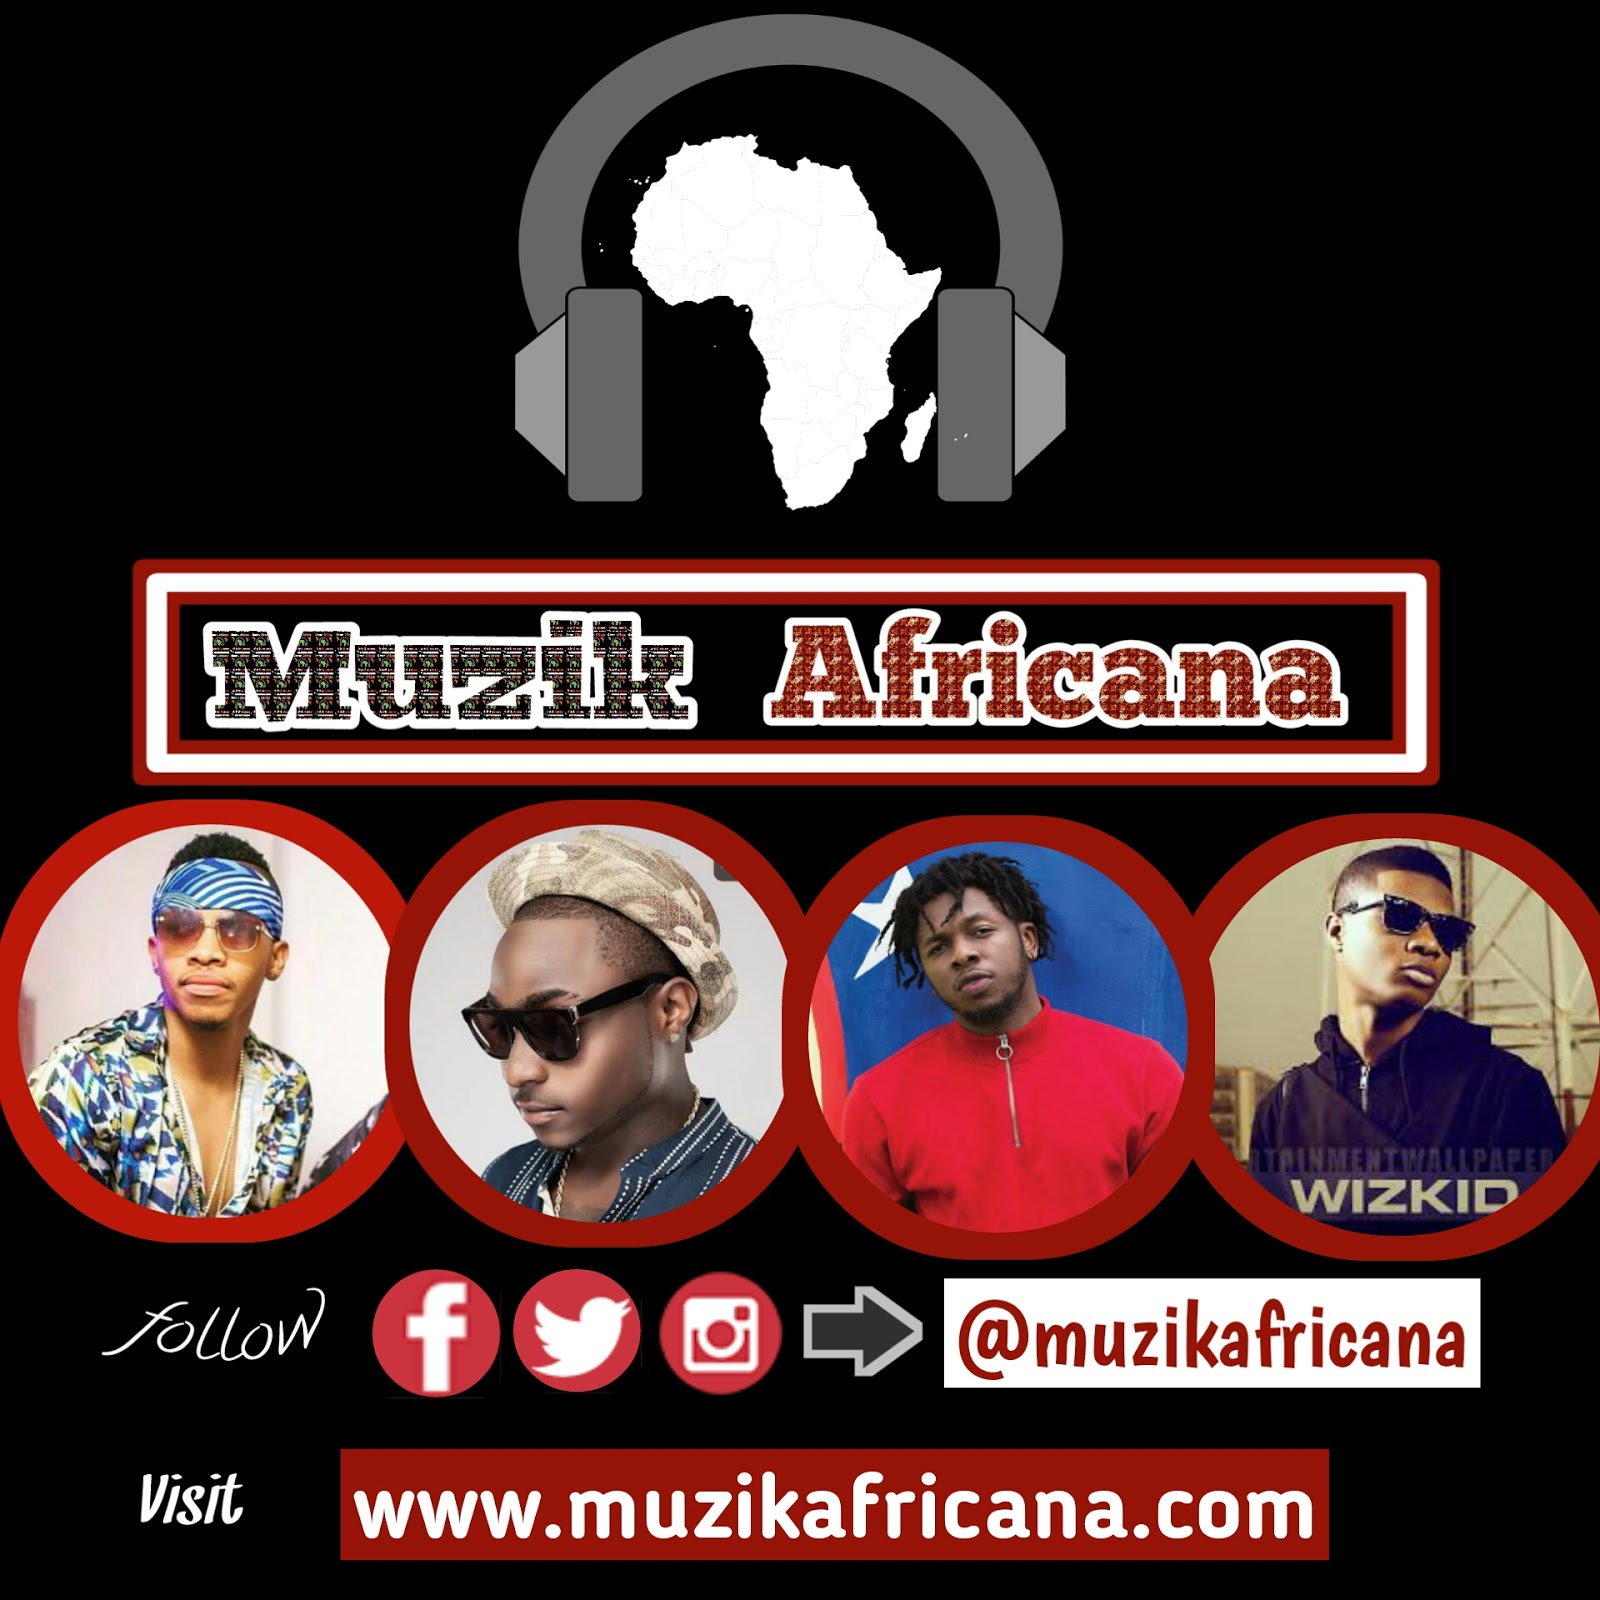 Upload Your Songs To Muzik Africana